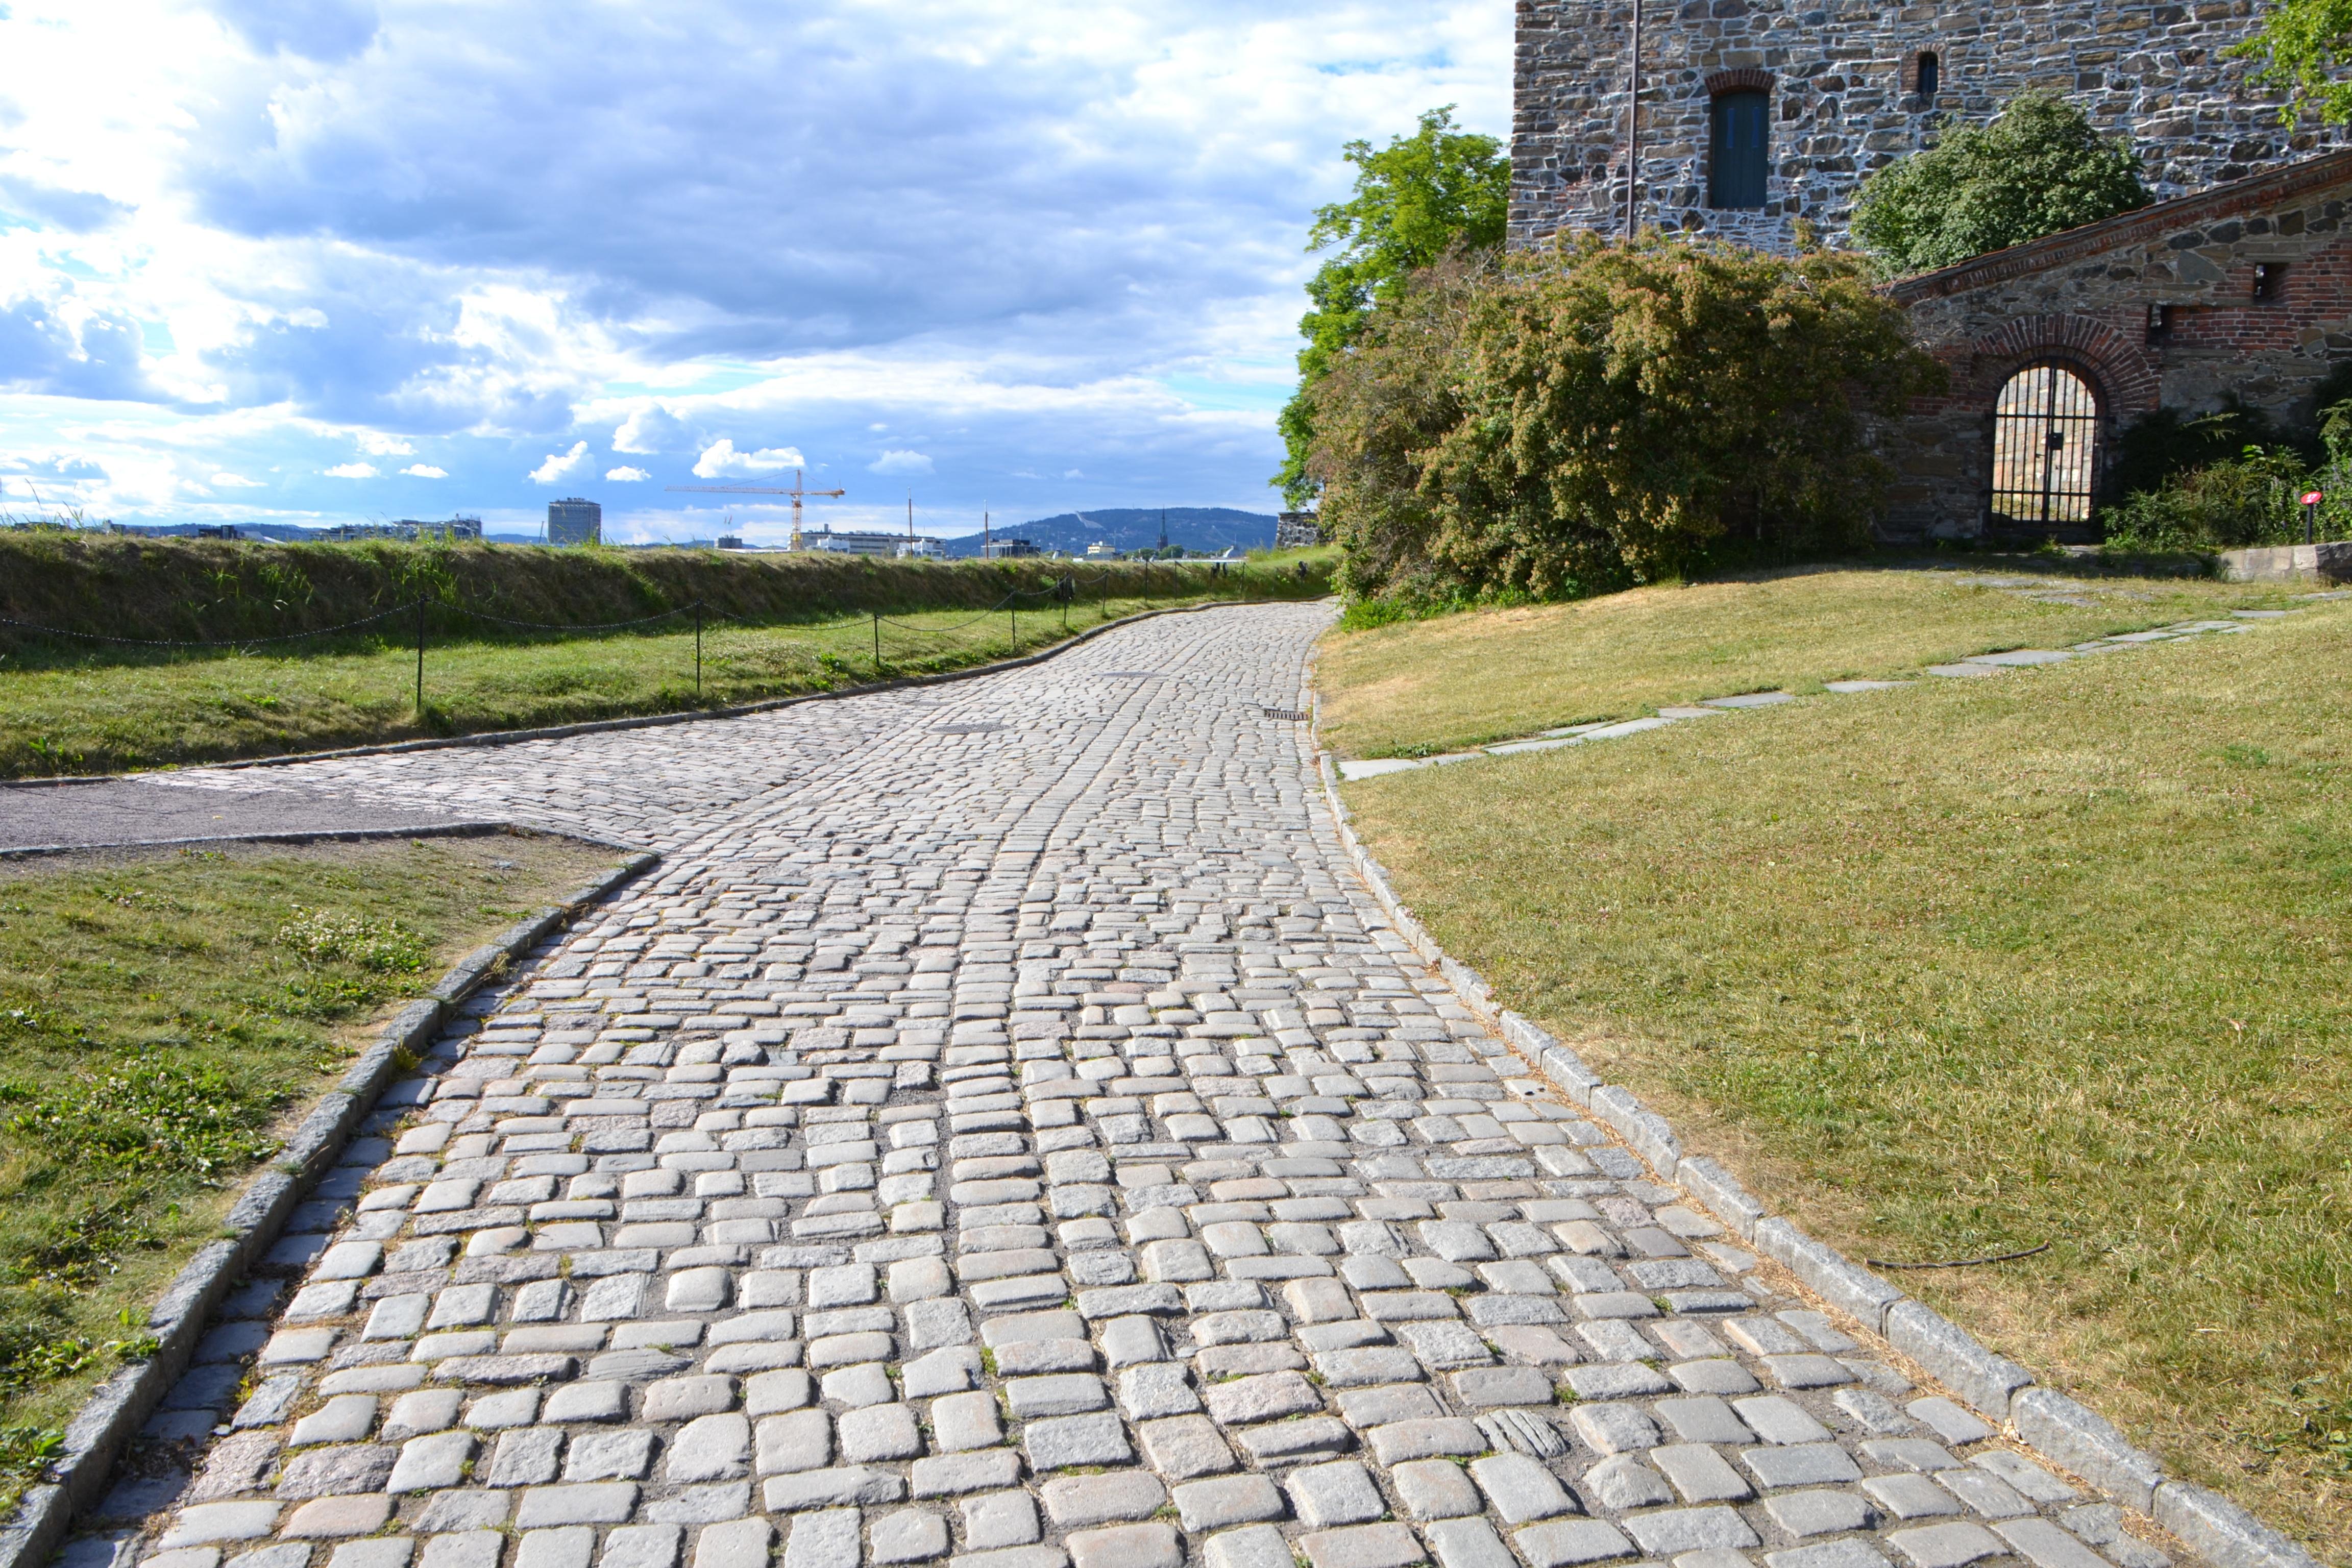 Free grass lawn sidewalk cobblestone wall asphalt